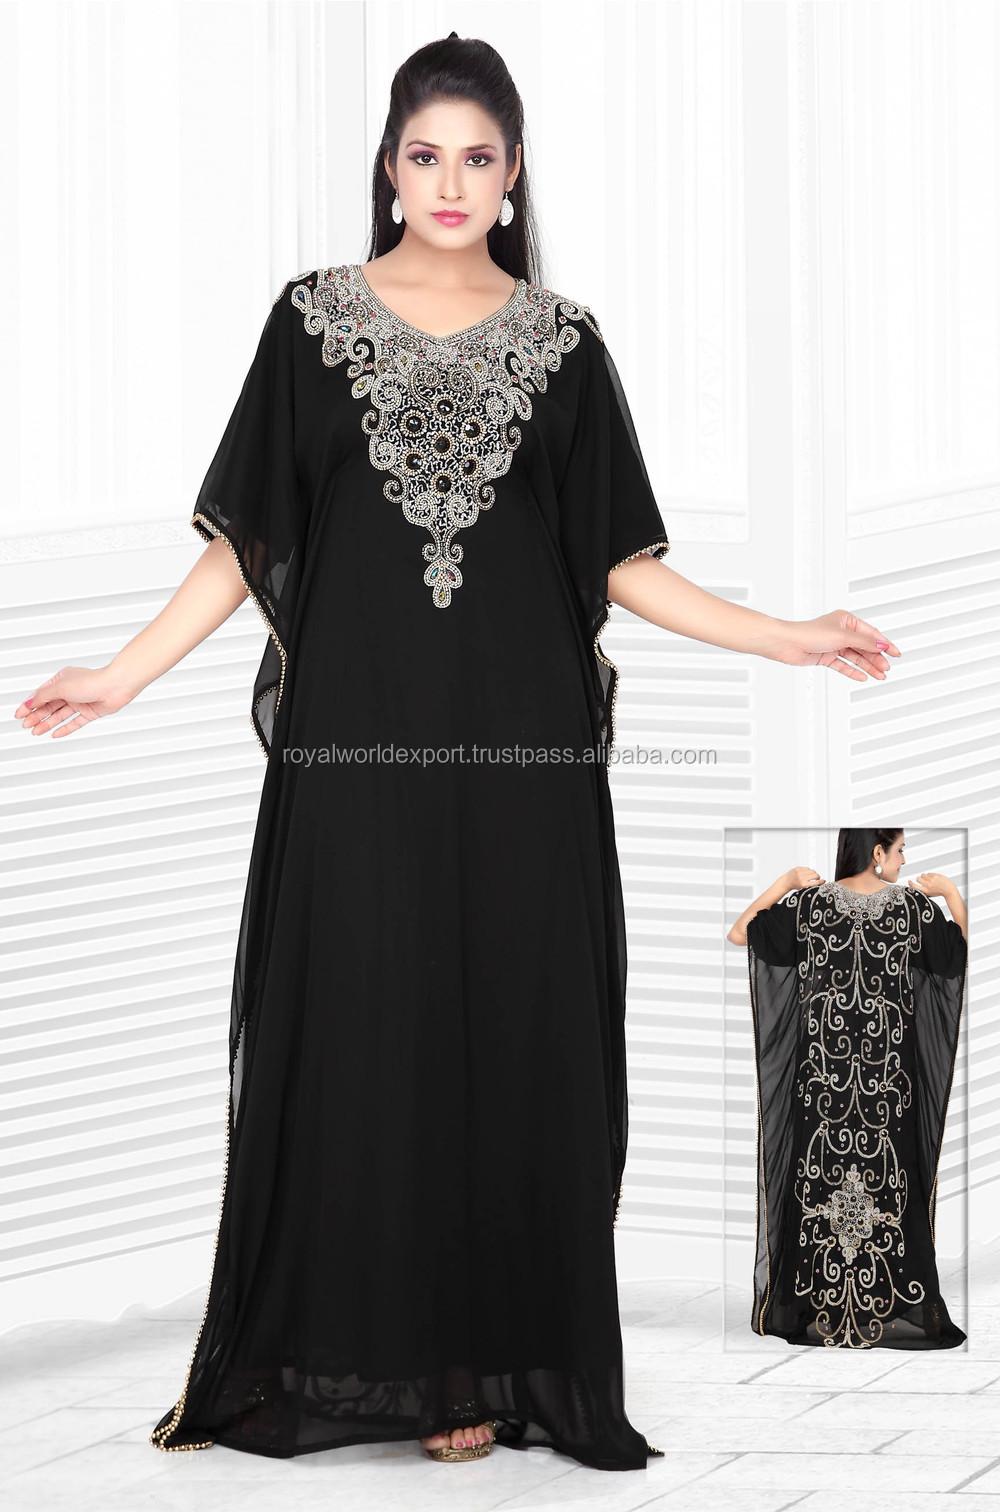 Muslim Fashion Dresses Images